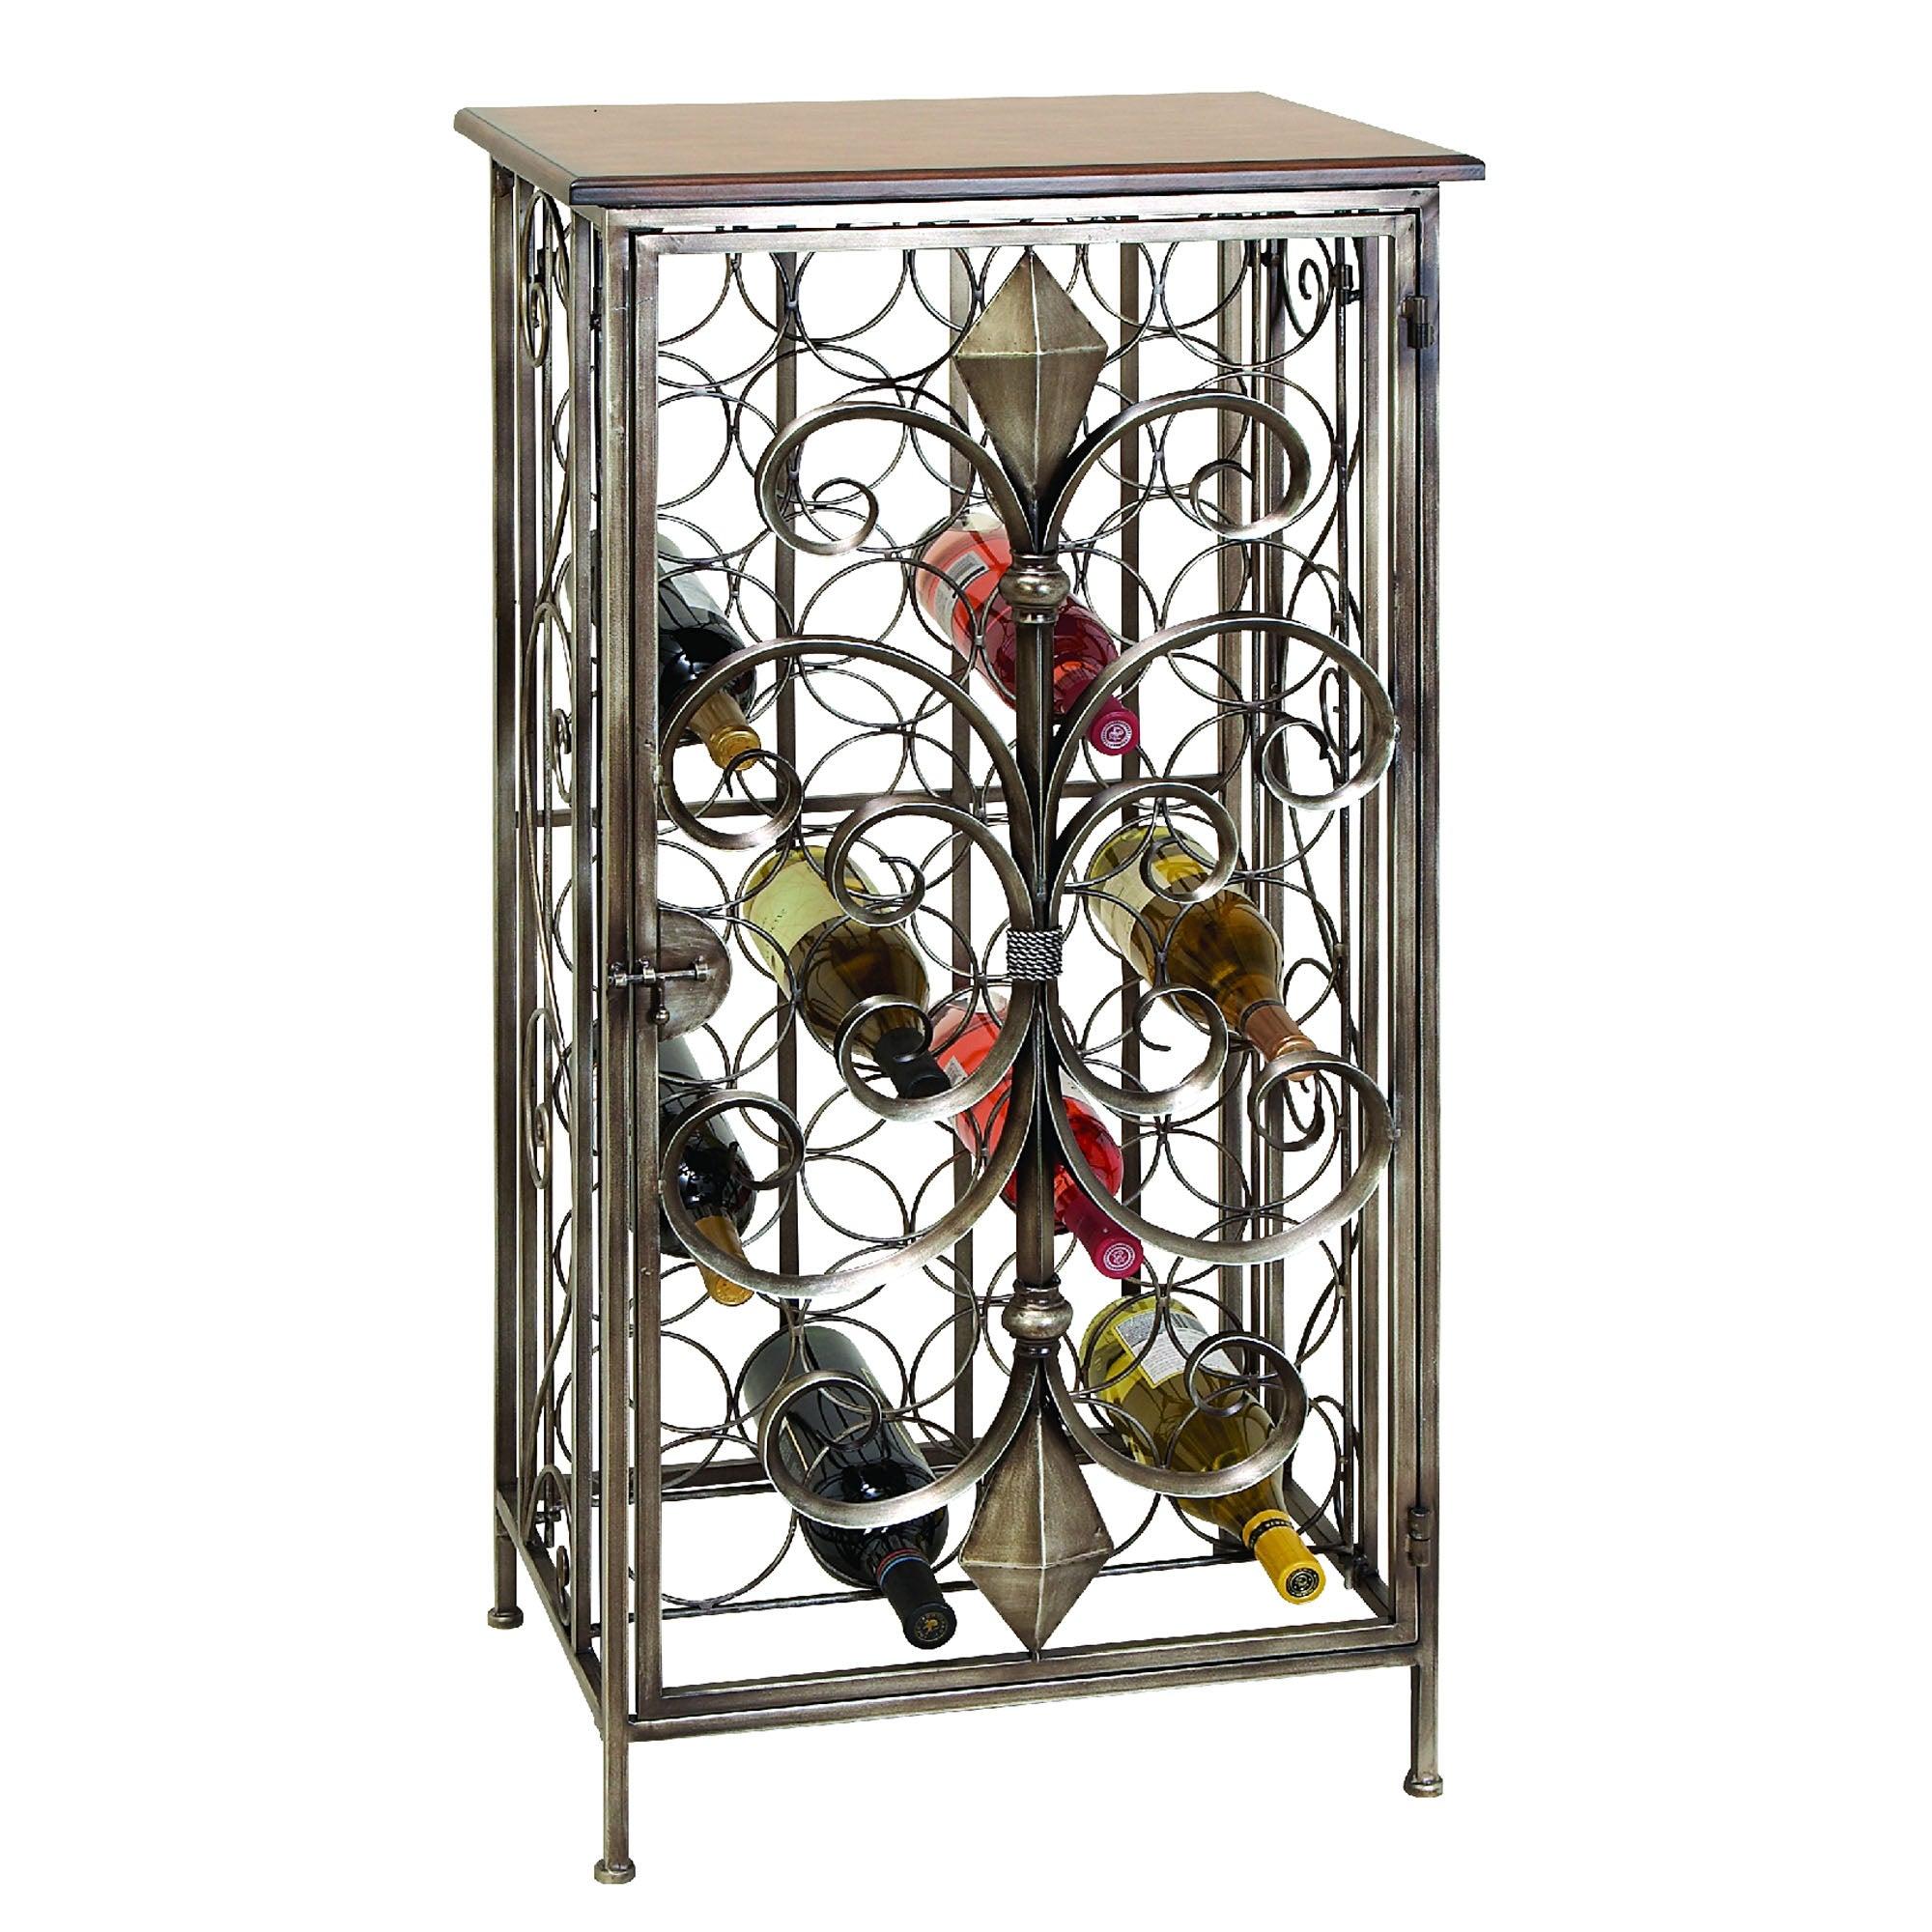 Casa Cortes Wrought Iron 32-bottle Wine Holder Rack